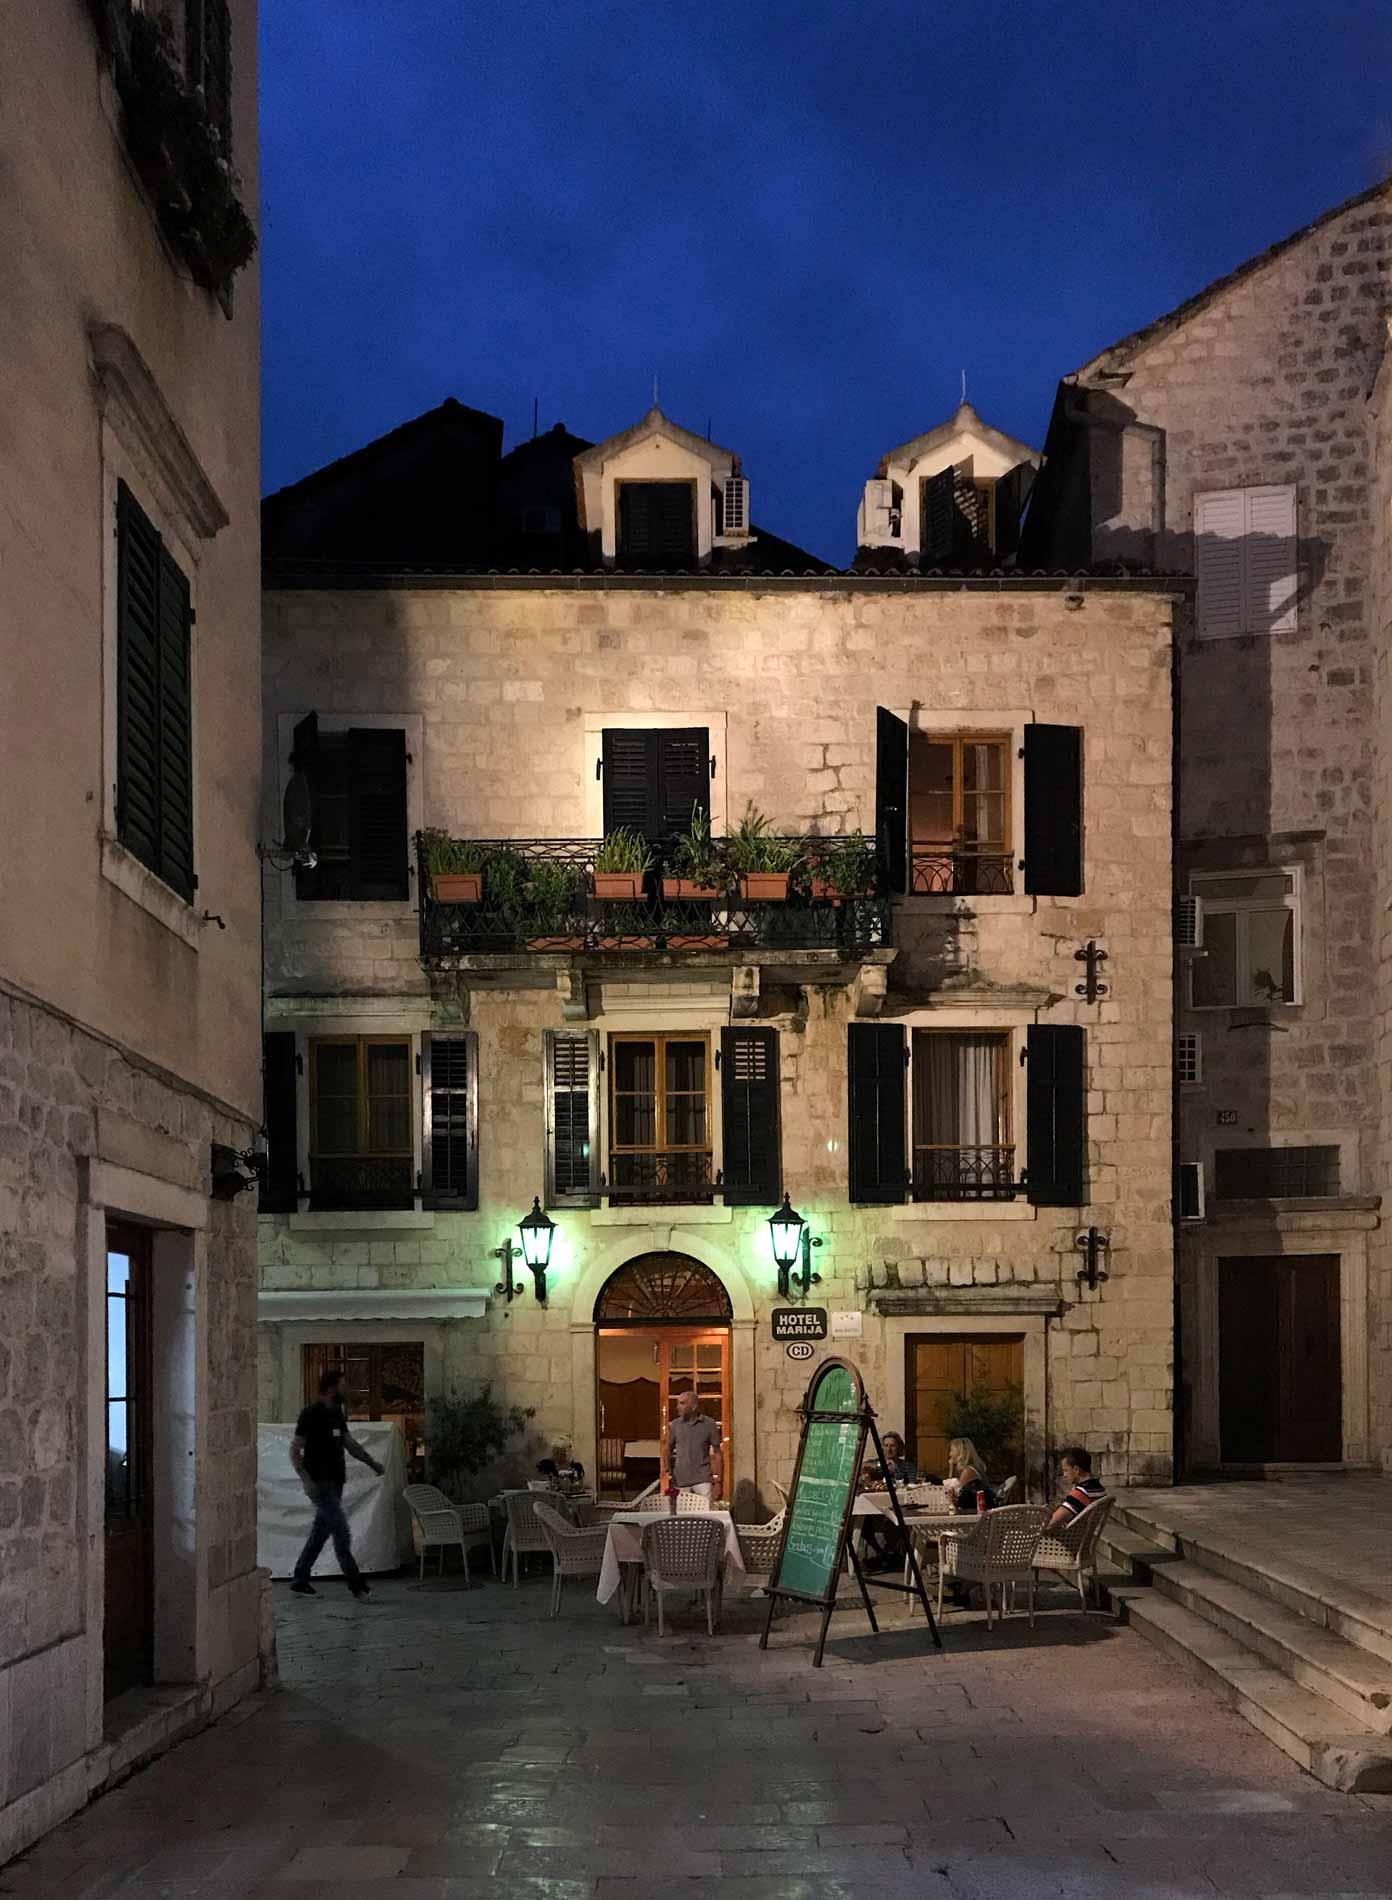 Kotor-Montenegro-hotel-tavolini-turisti-ora-blu-Ulica1-luci